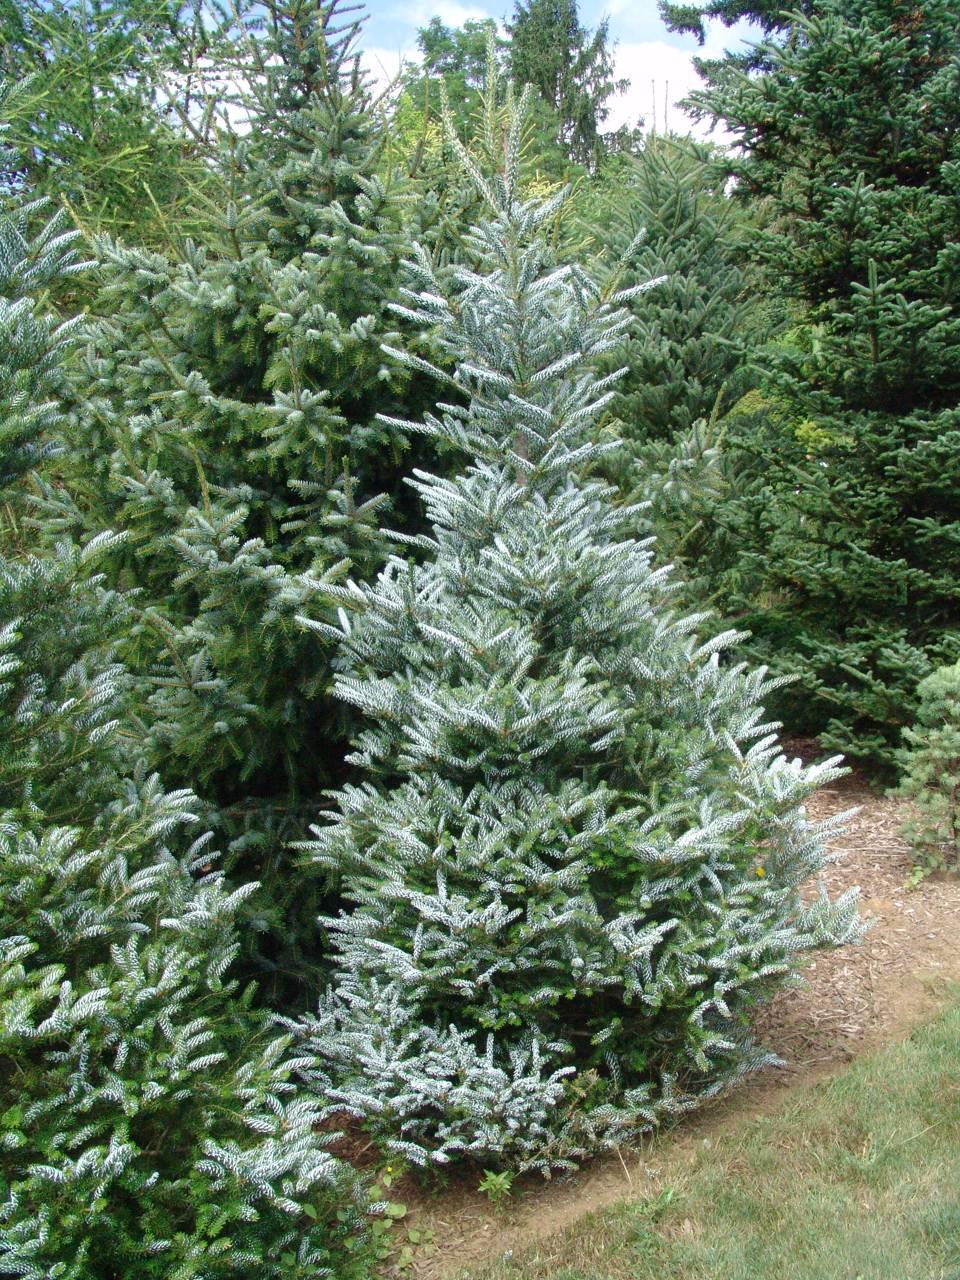 Abies koreana Horstmann's Silberlocke conifer evergreen cones white